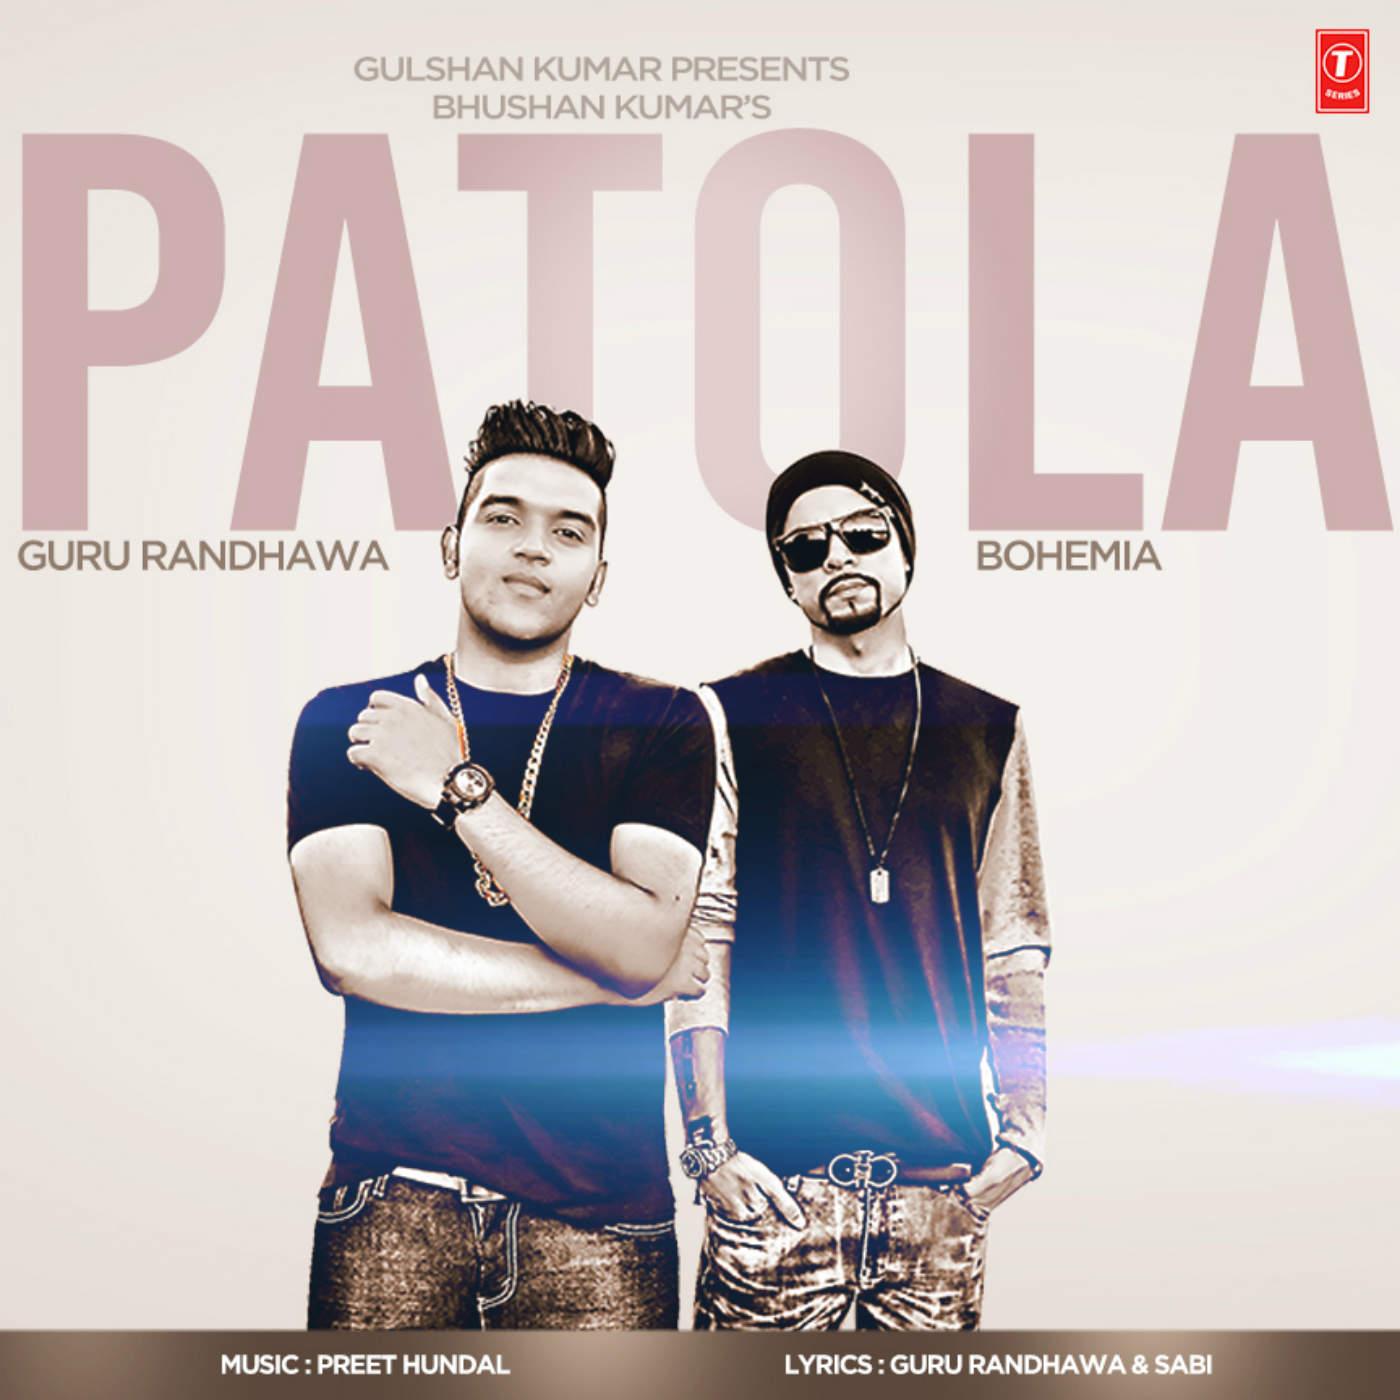 Guru Randhawa - Patola (feat. Bohemia) - Single